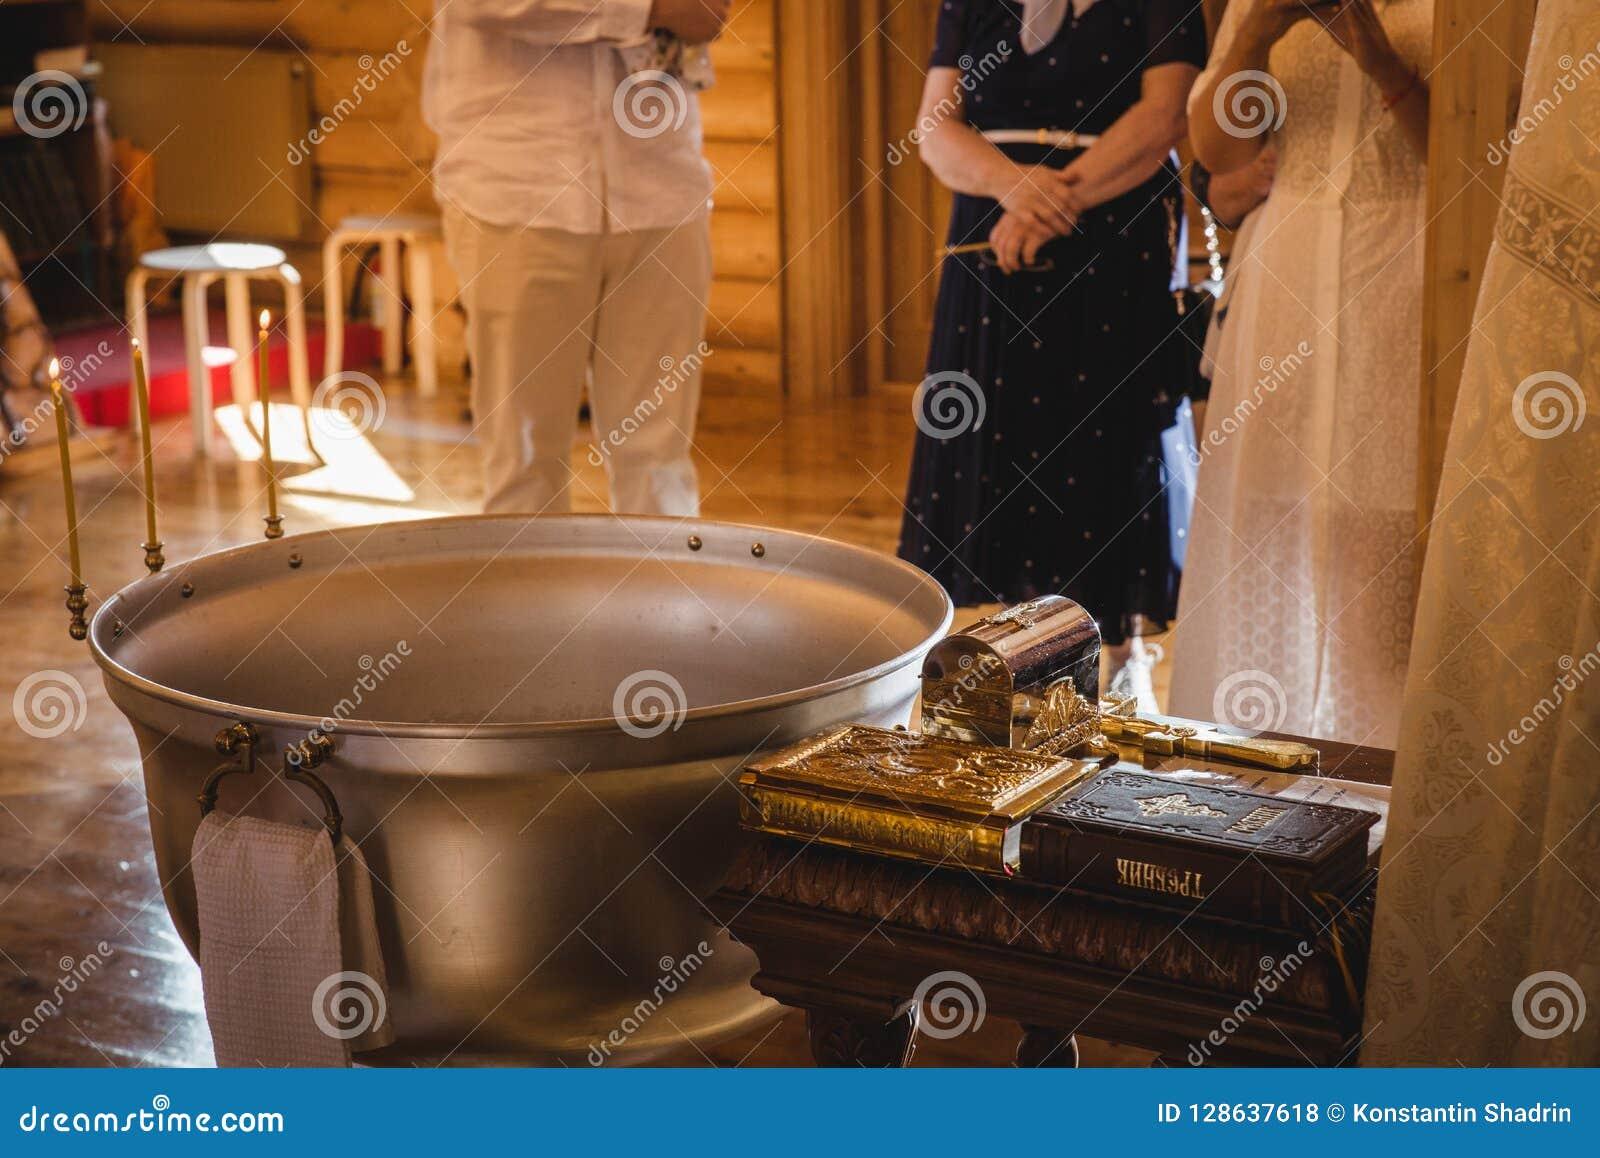 Christening Ceremony In The Orthodox Church, Priest Lighting